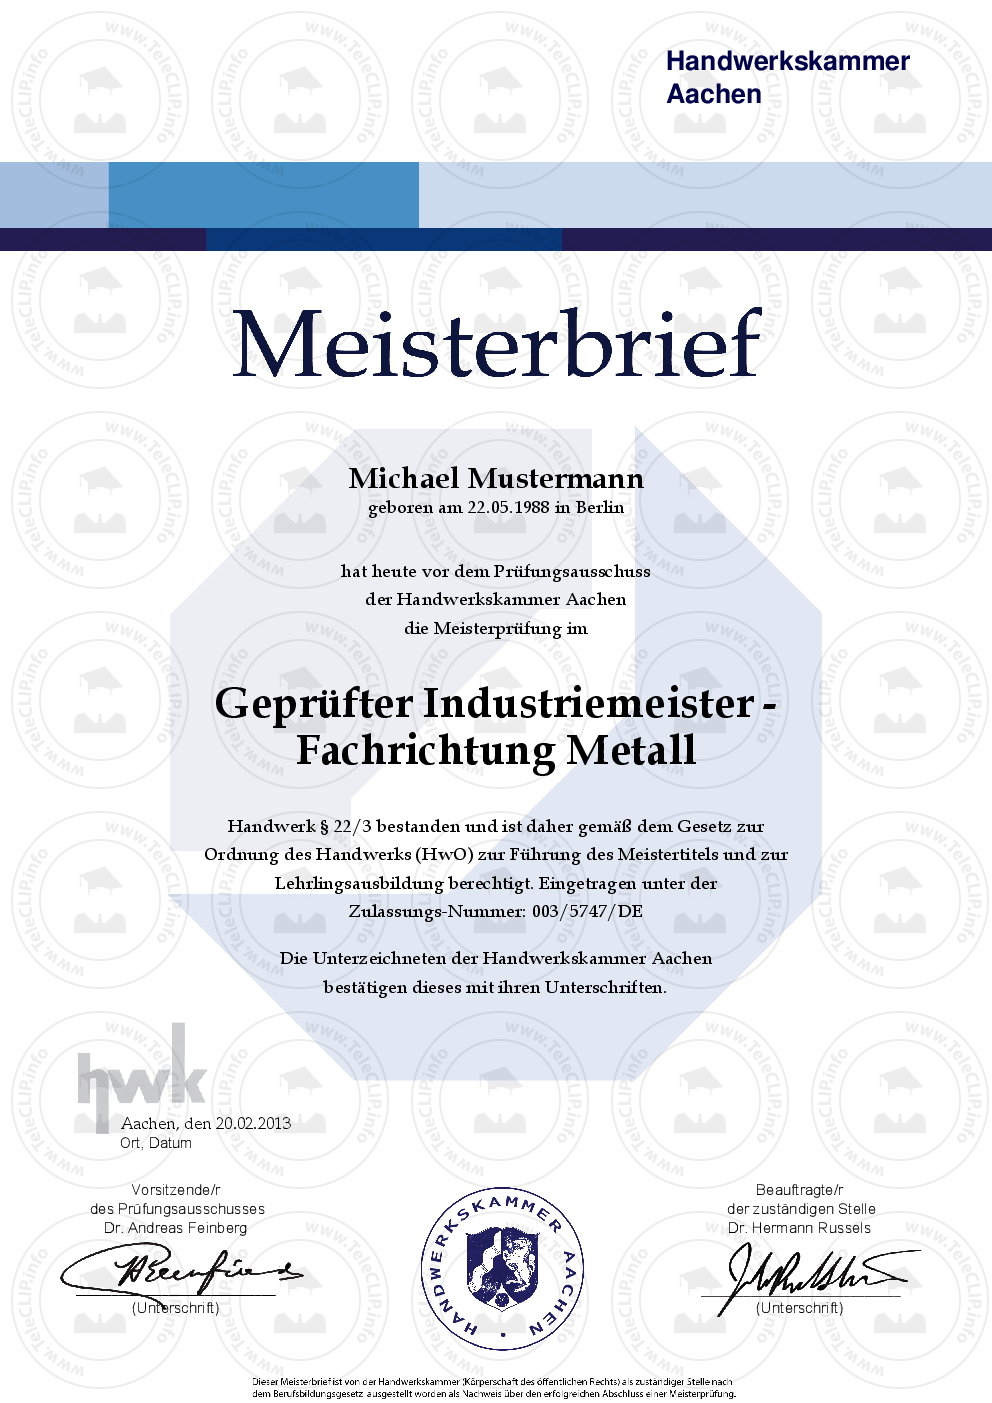 hwk_meisterbrief_1b